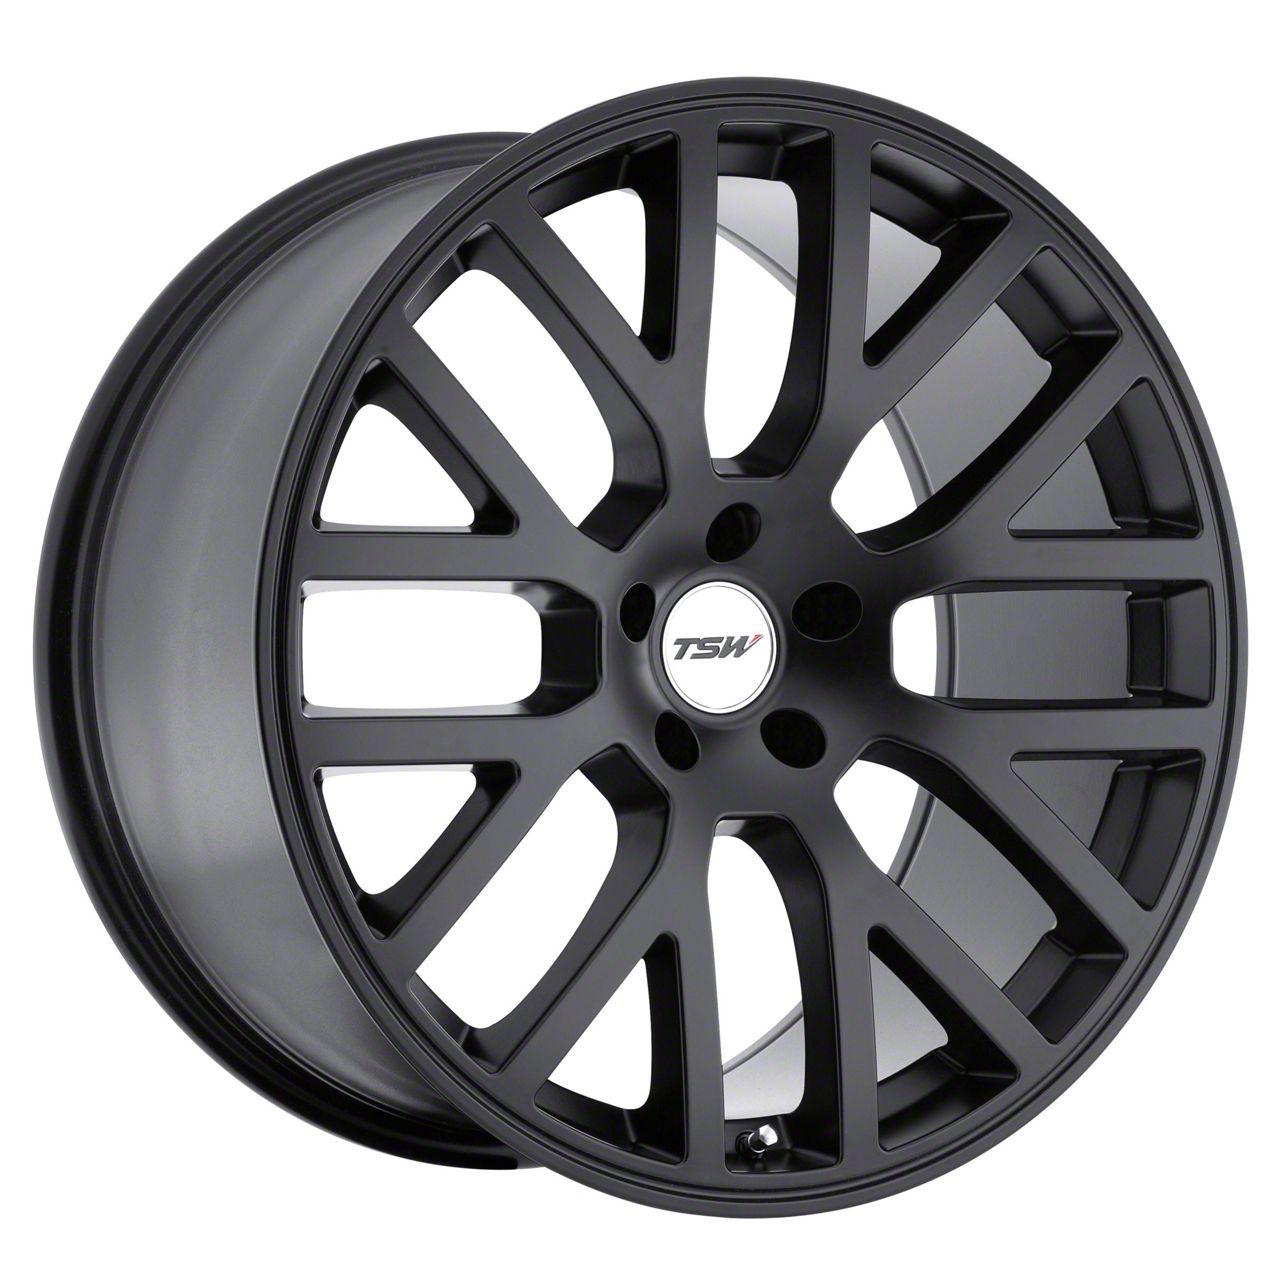 TSW Donington Matte Black Wheel - 19x9.5 (15-19 GT, EcoBoost, V6)